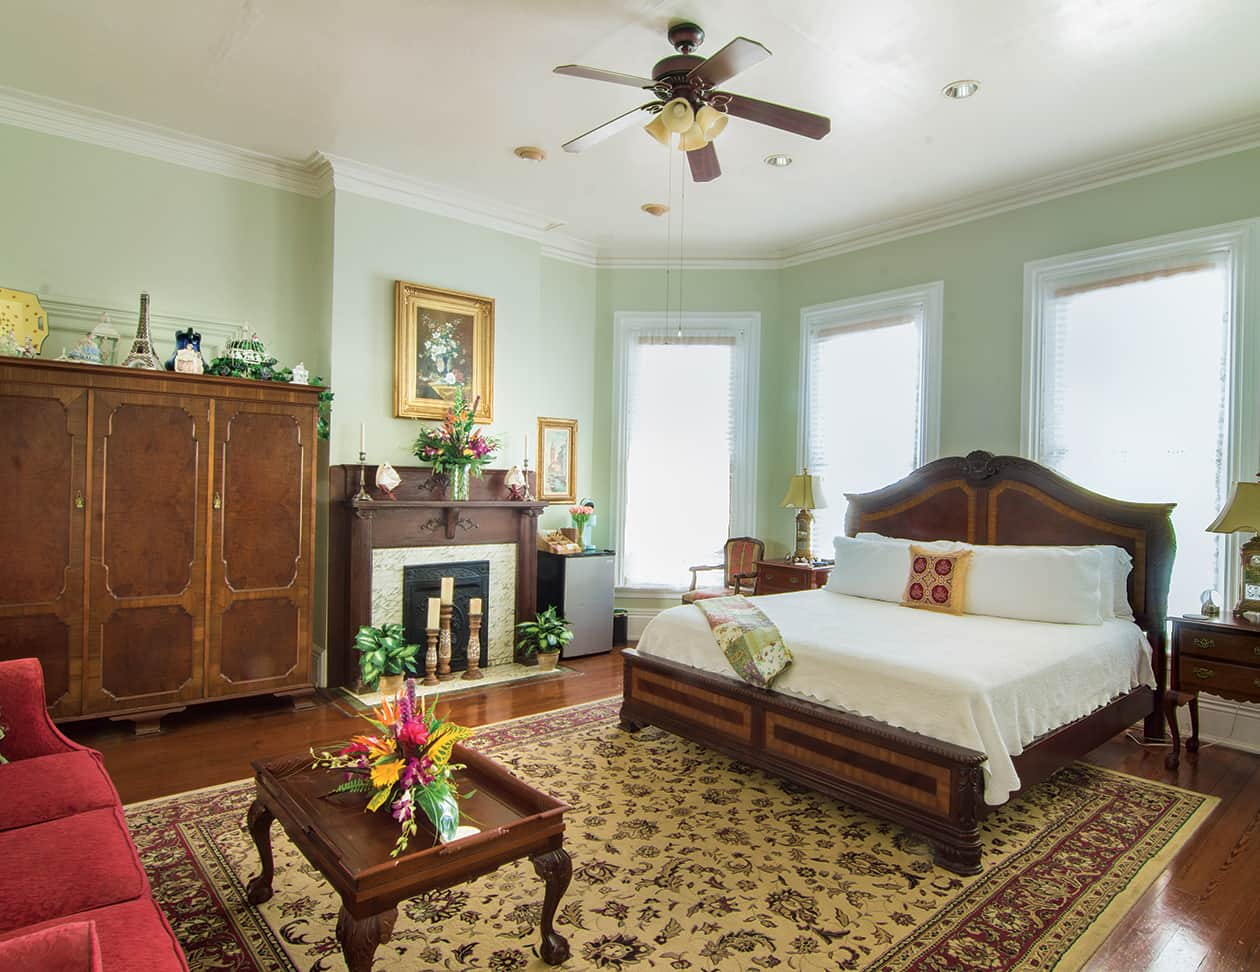 Anne Suite bed at our Romantic Key West, FL Inn